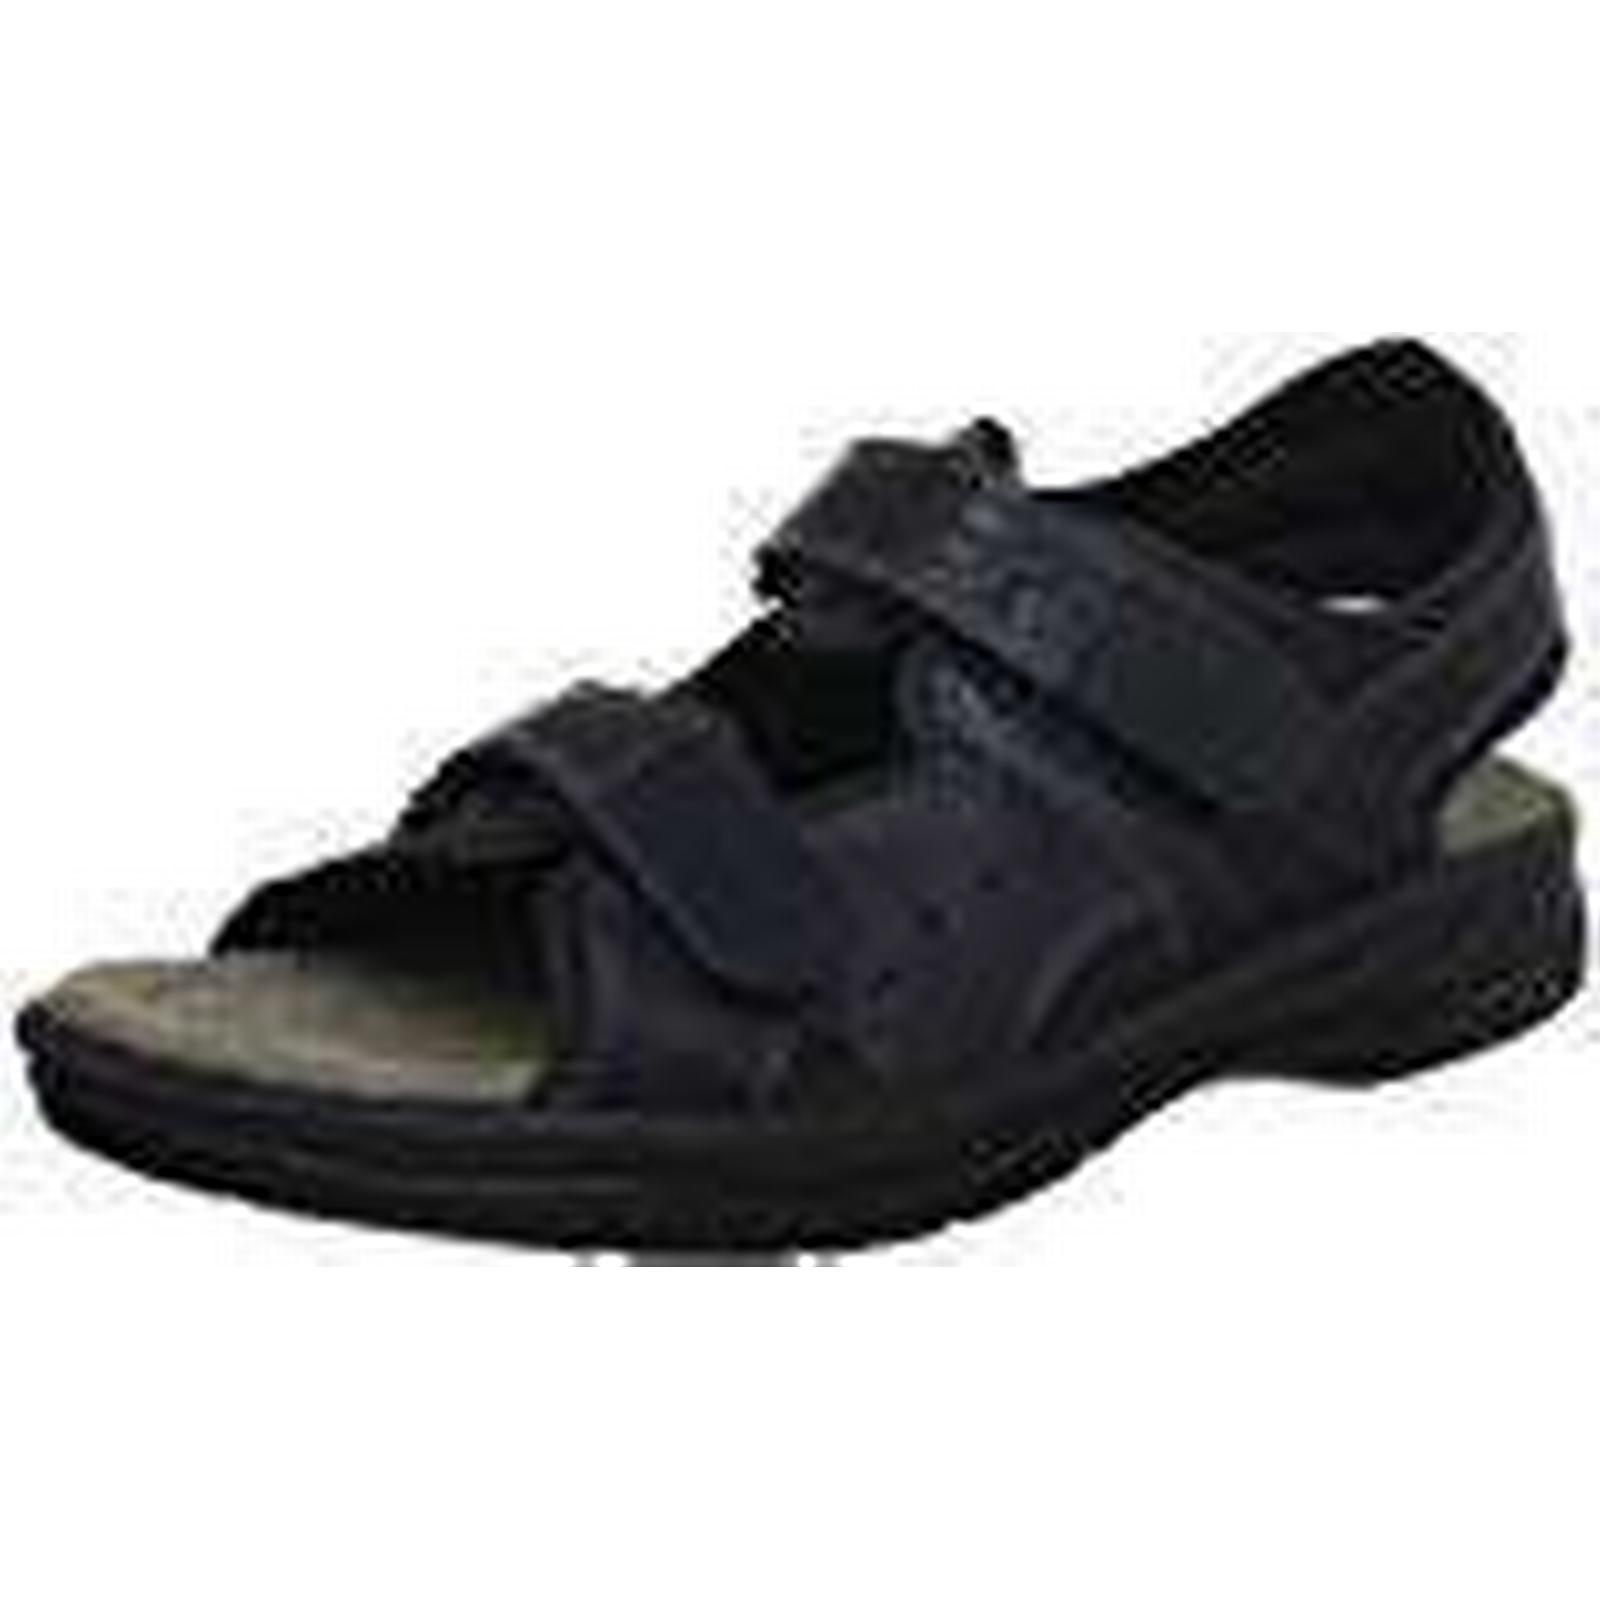 Jomos Men's Activa 3 Sandals 12 Black Size: 12 Sandals 58d0fa